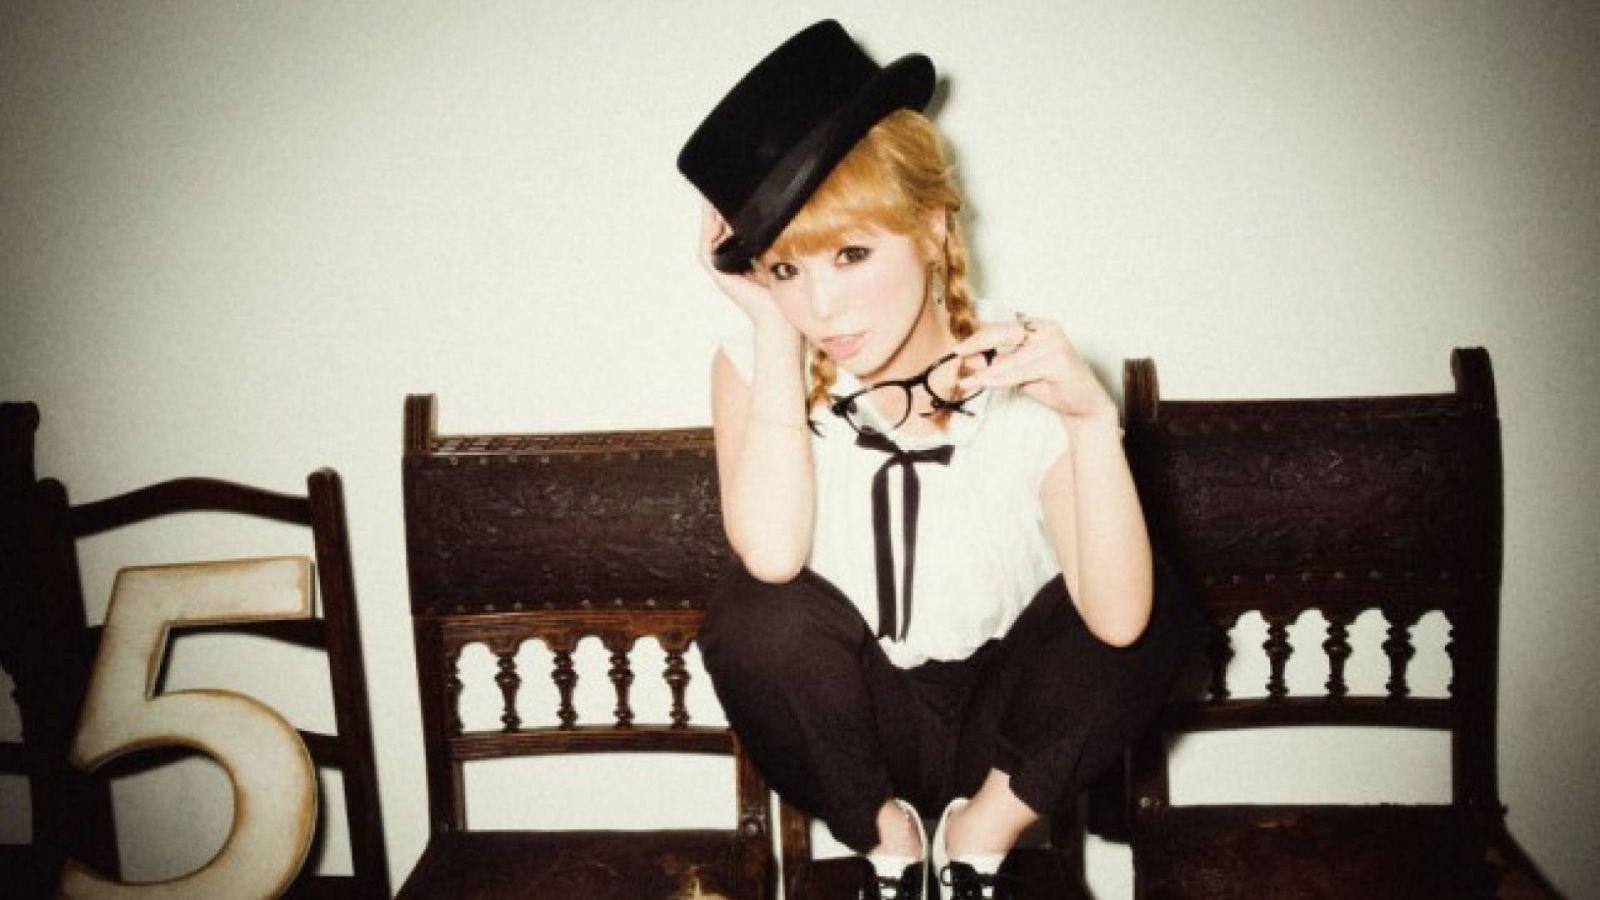 AZU © Sony Music Entertainment (Japan) Inc.